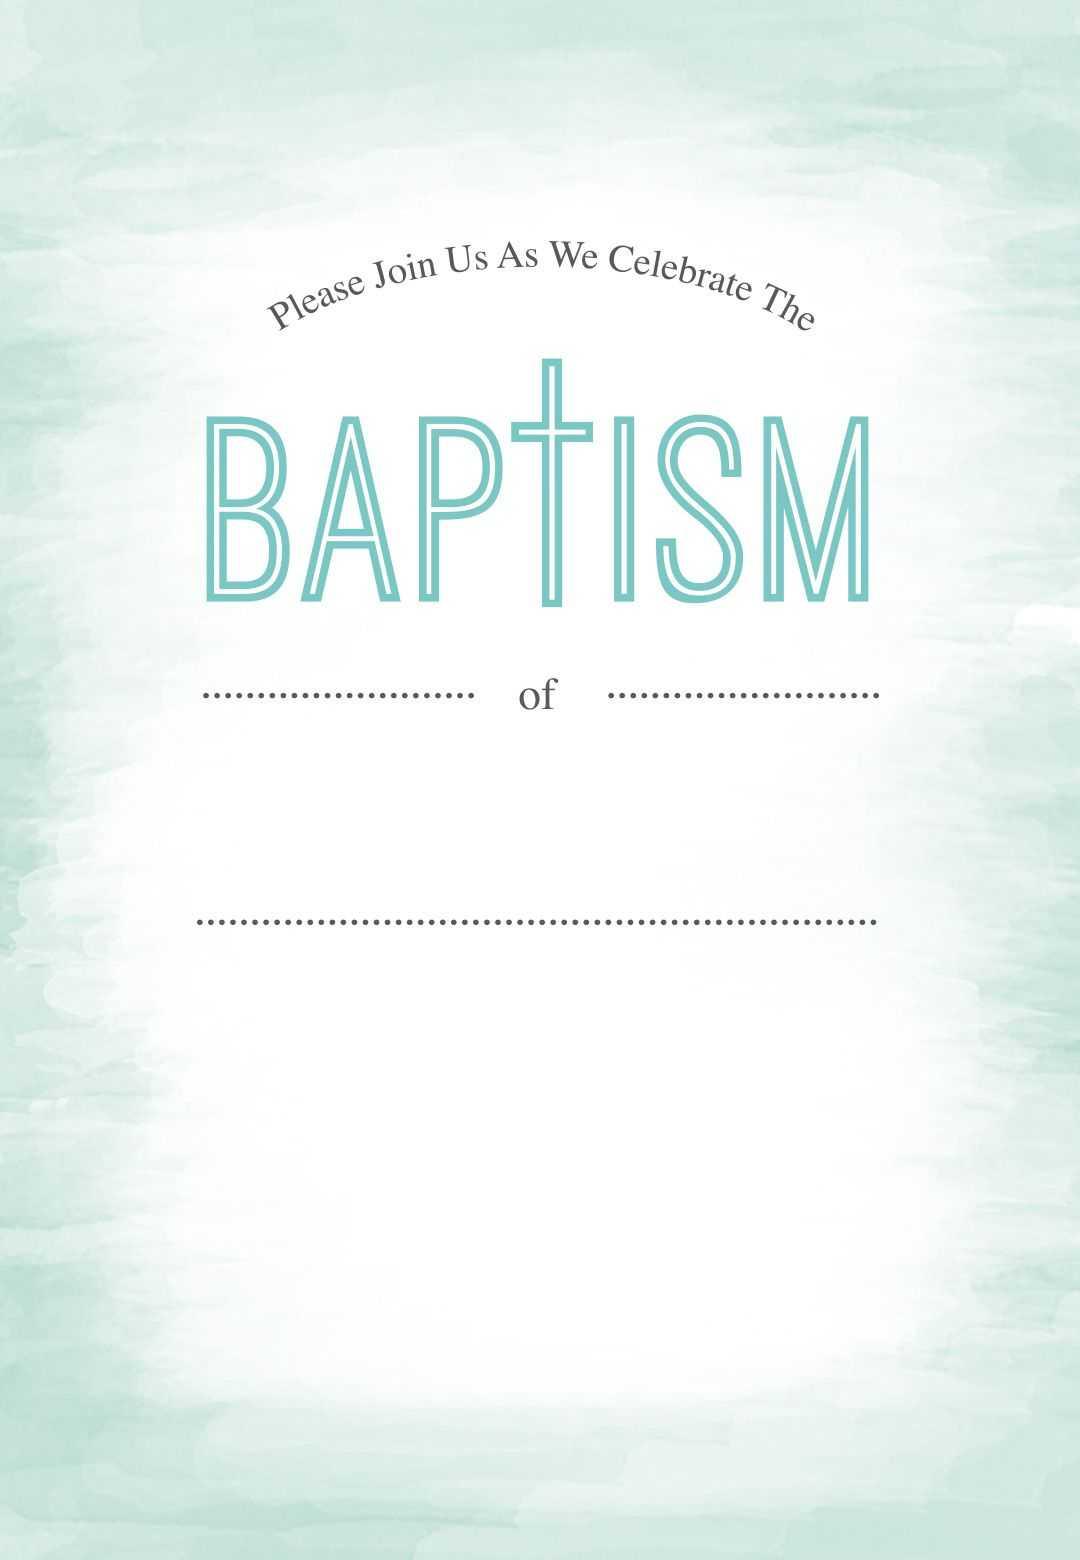 Water - Baptism & Christening Invitation Template (Free With Regard To Blank Christening Invitation Templates